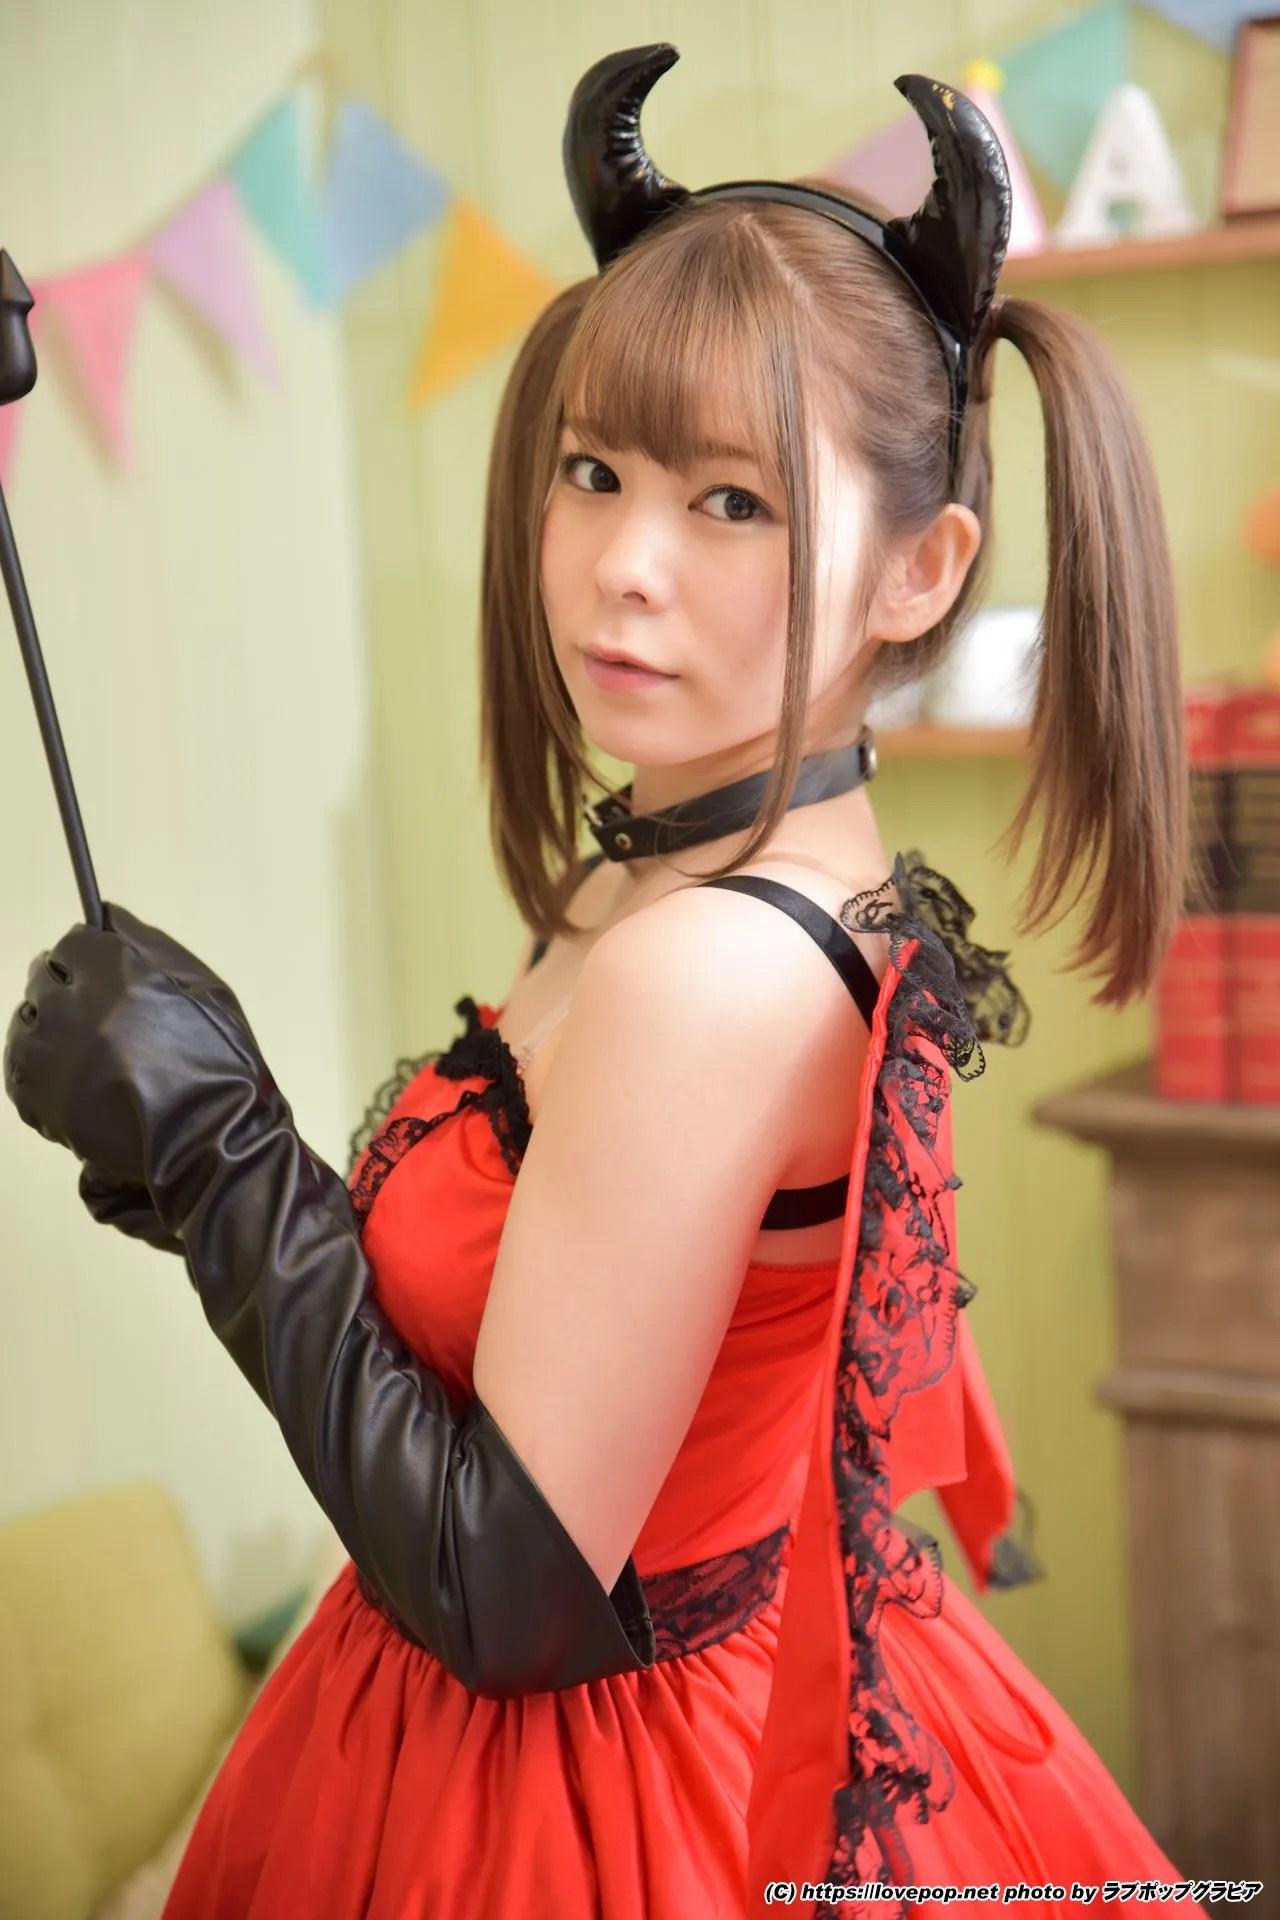 [LOVEPOP] Ren Aragaki 新垣恋 Photoset 01 写真集[55P]插图(7)